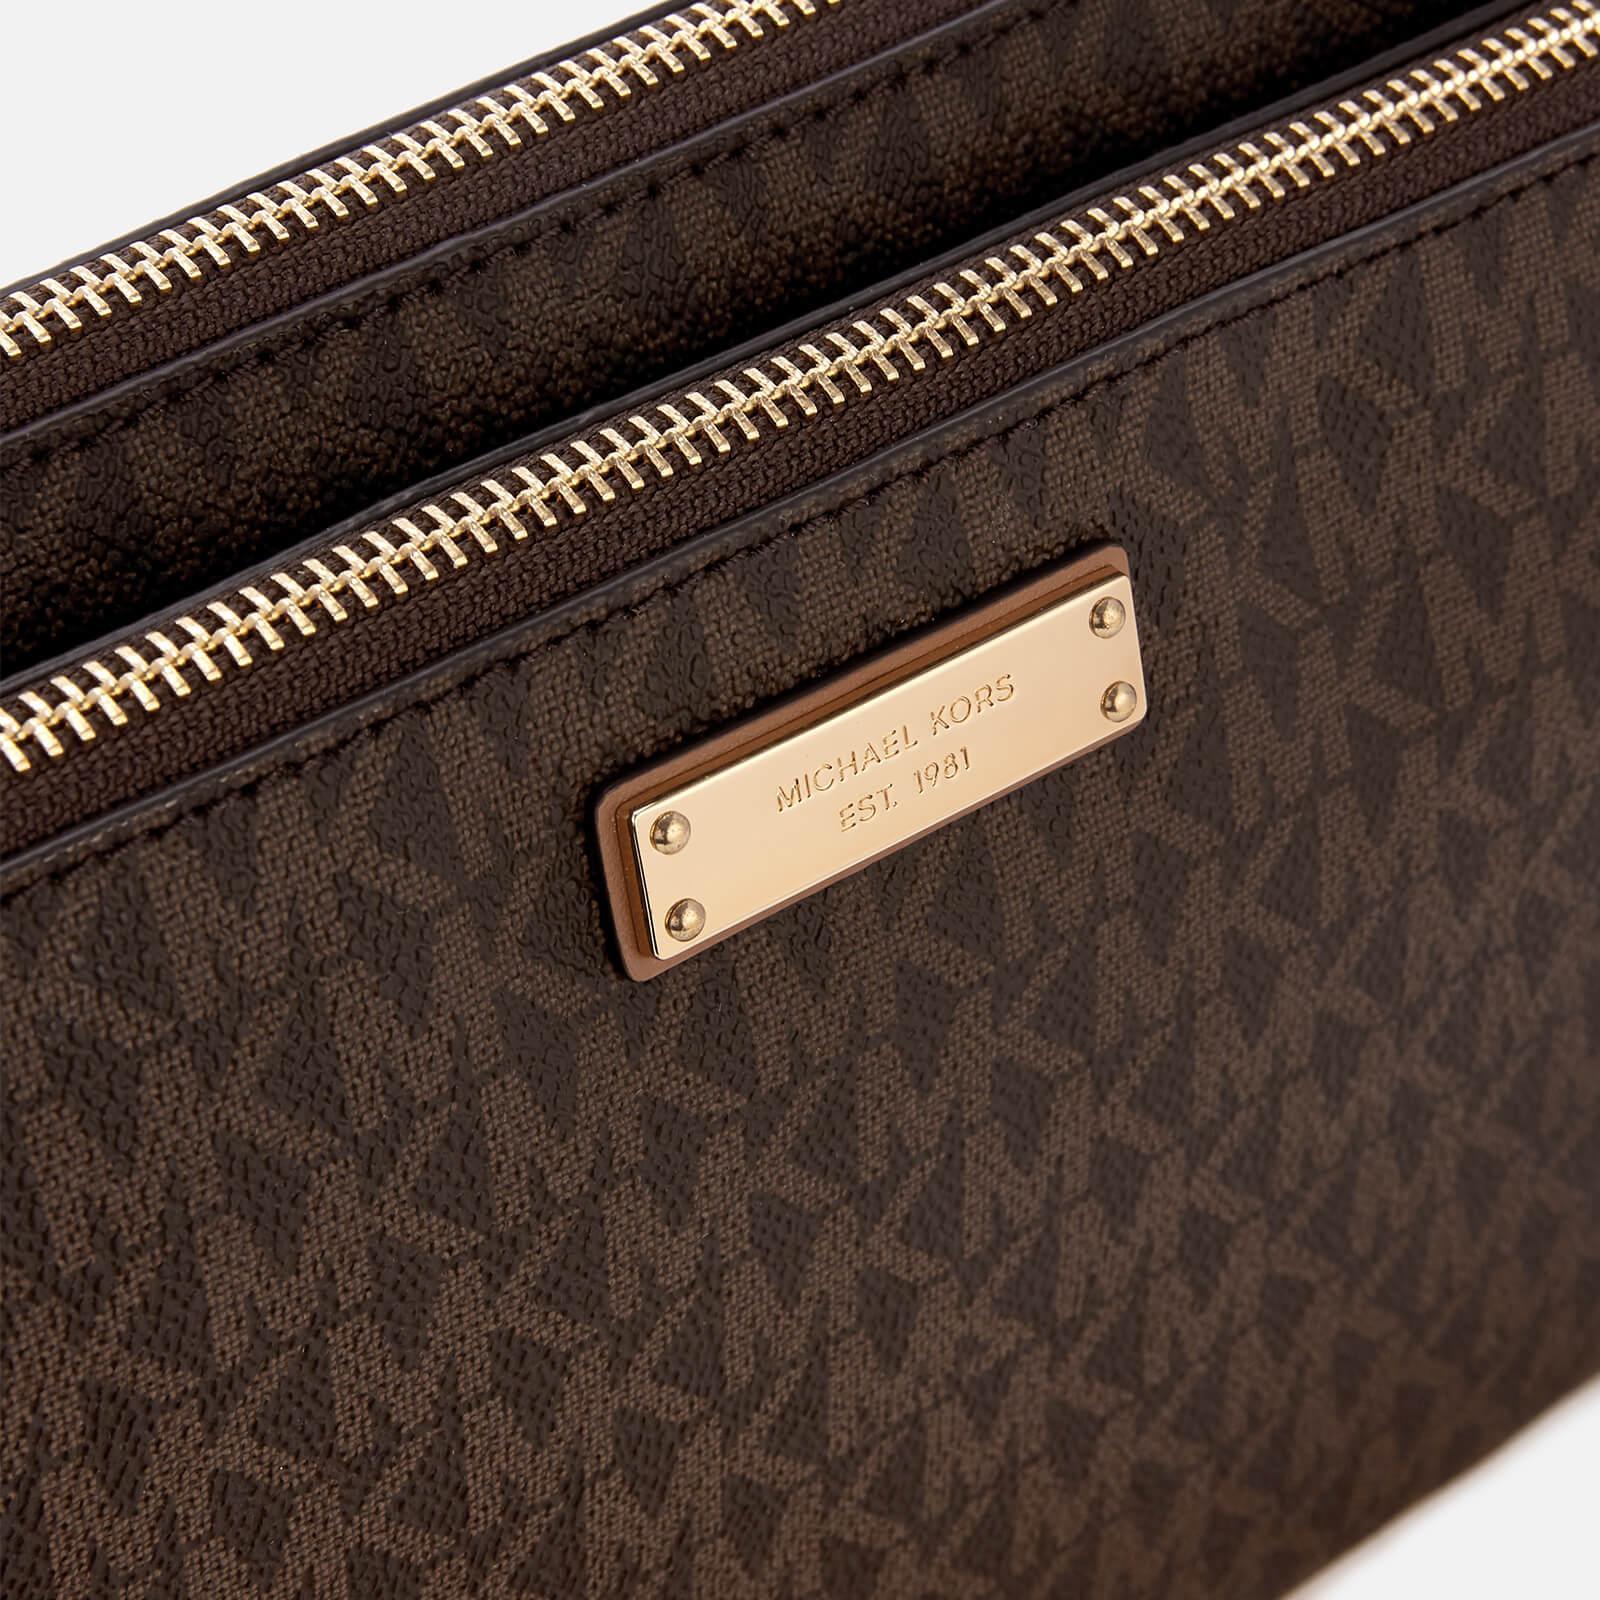 30a1bbfac449 MICHAEL Michael Kors Adele Double Zip Cross Body Bag in Brown - Lyst